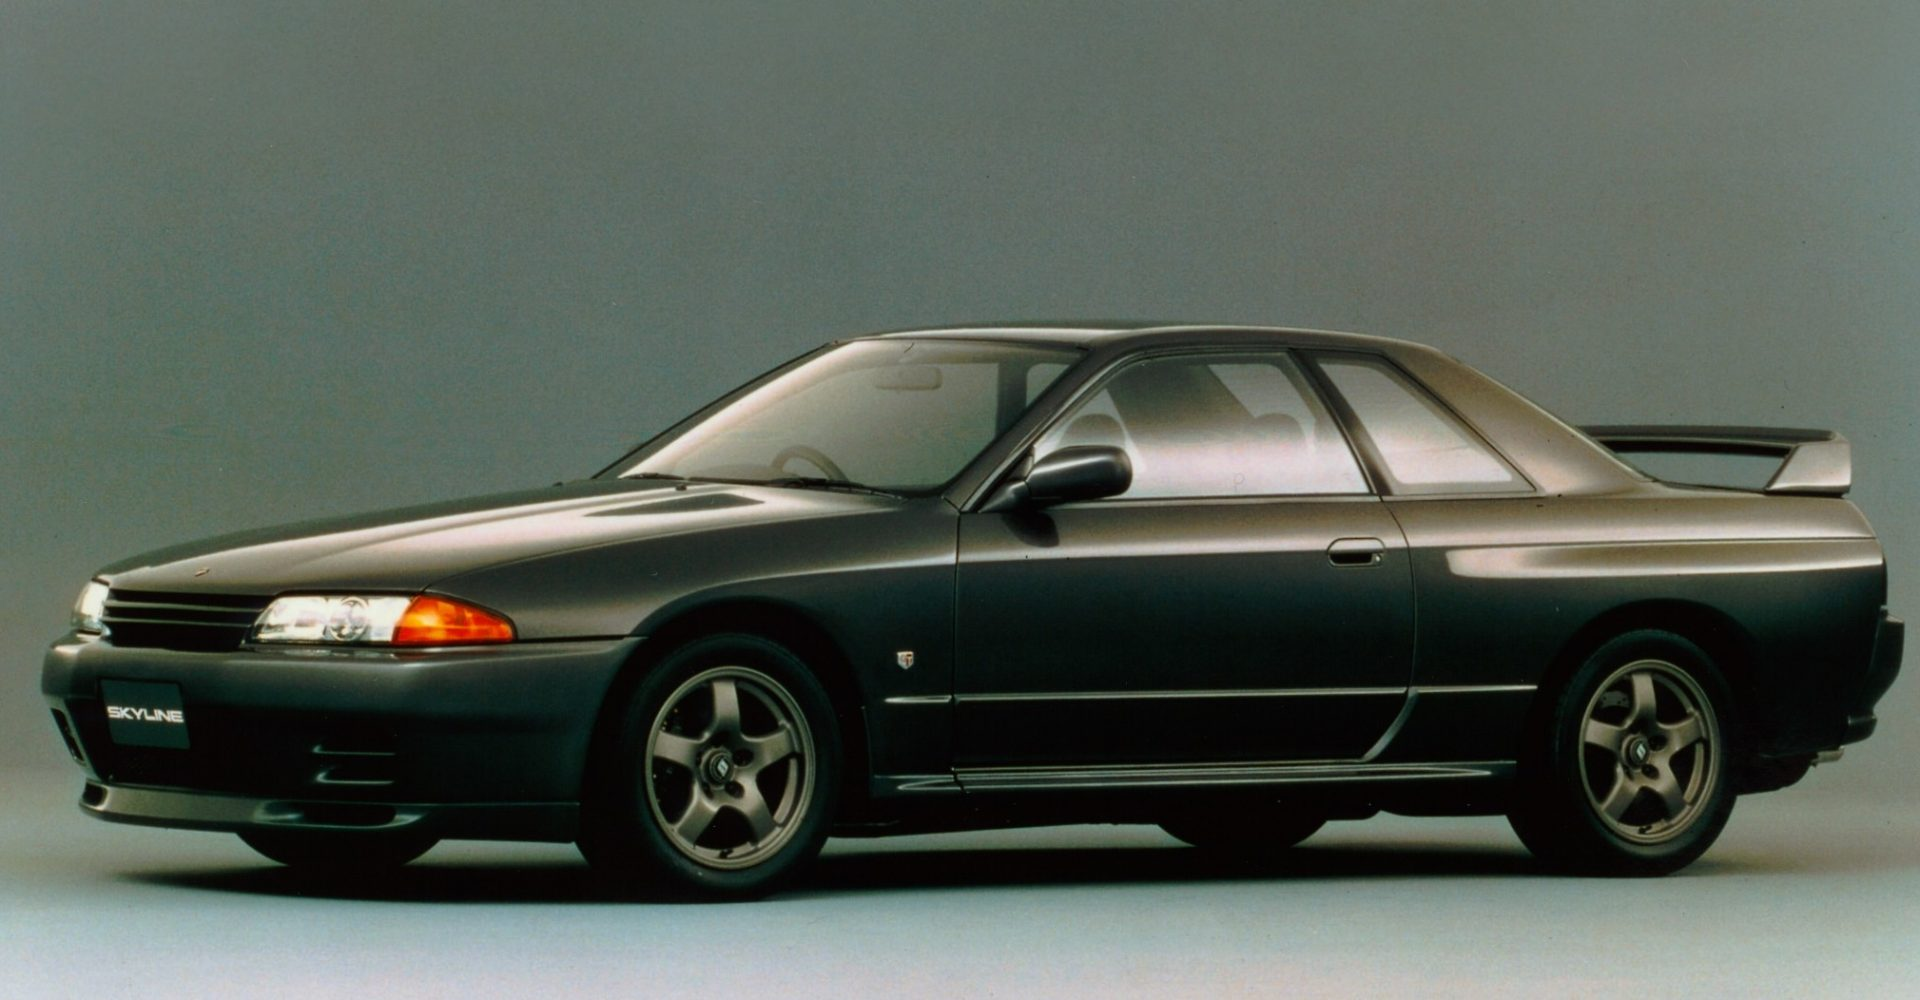 JDM fans, rejoice! Nissan is putting Skyline parts back into production.